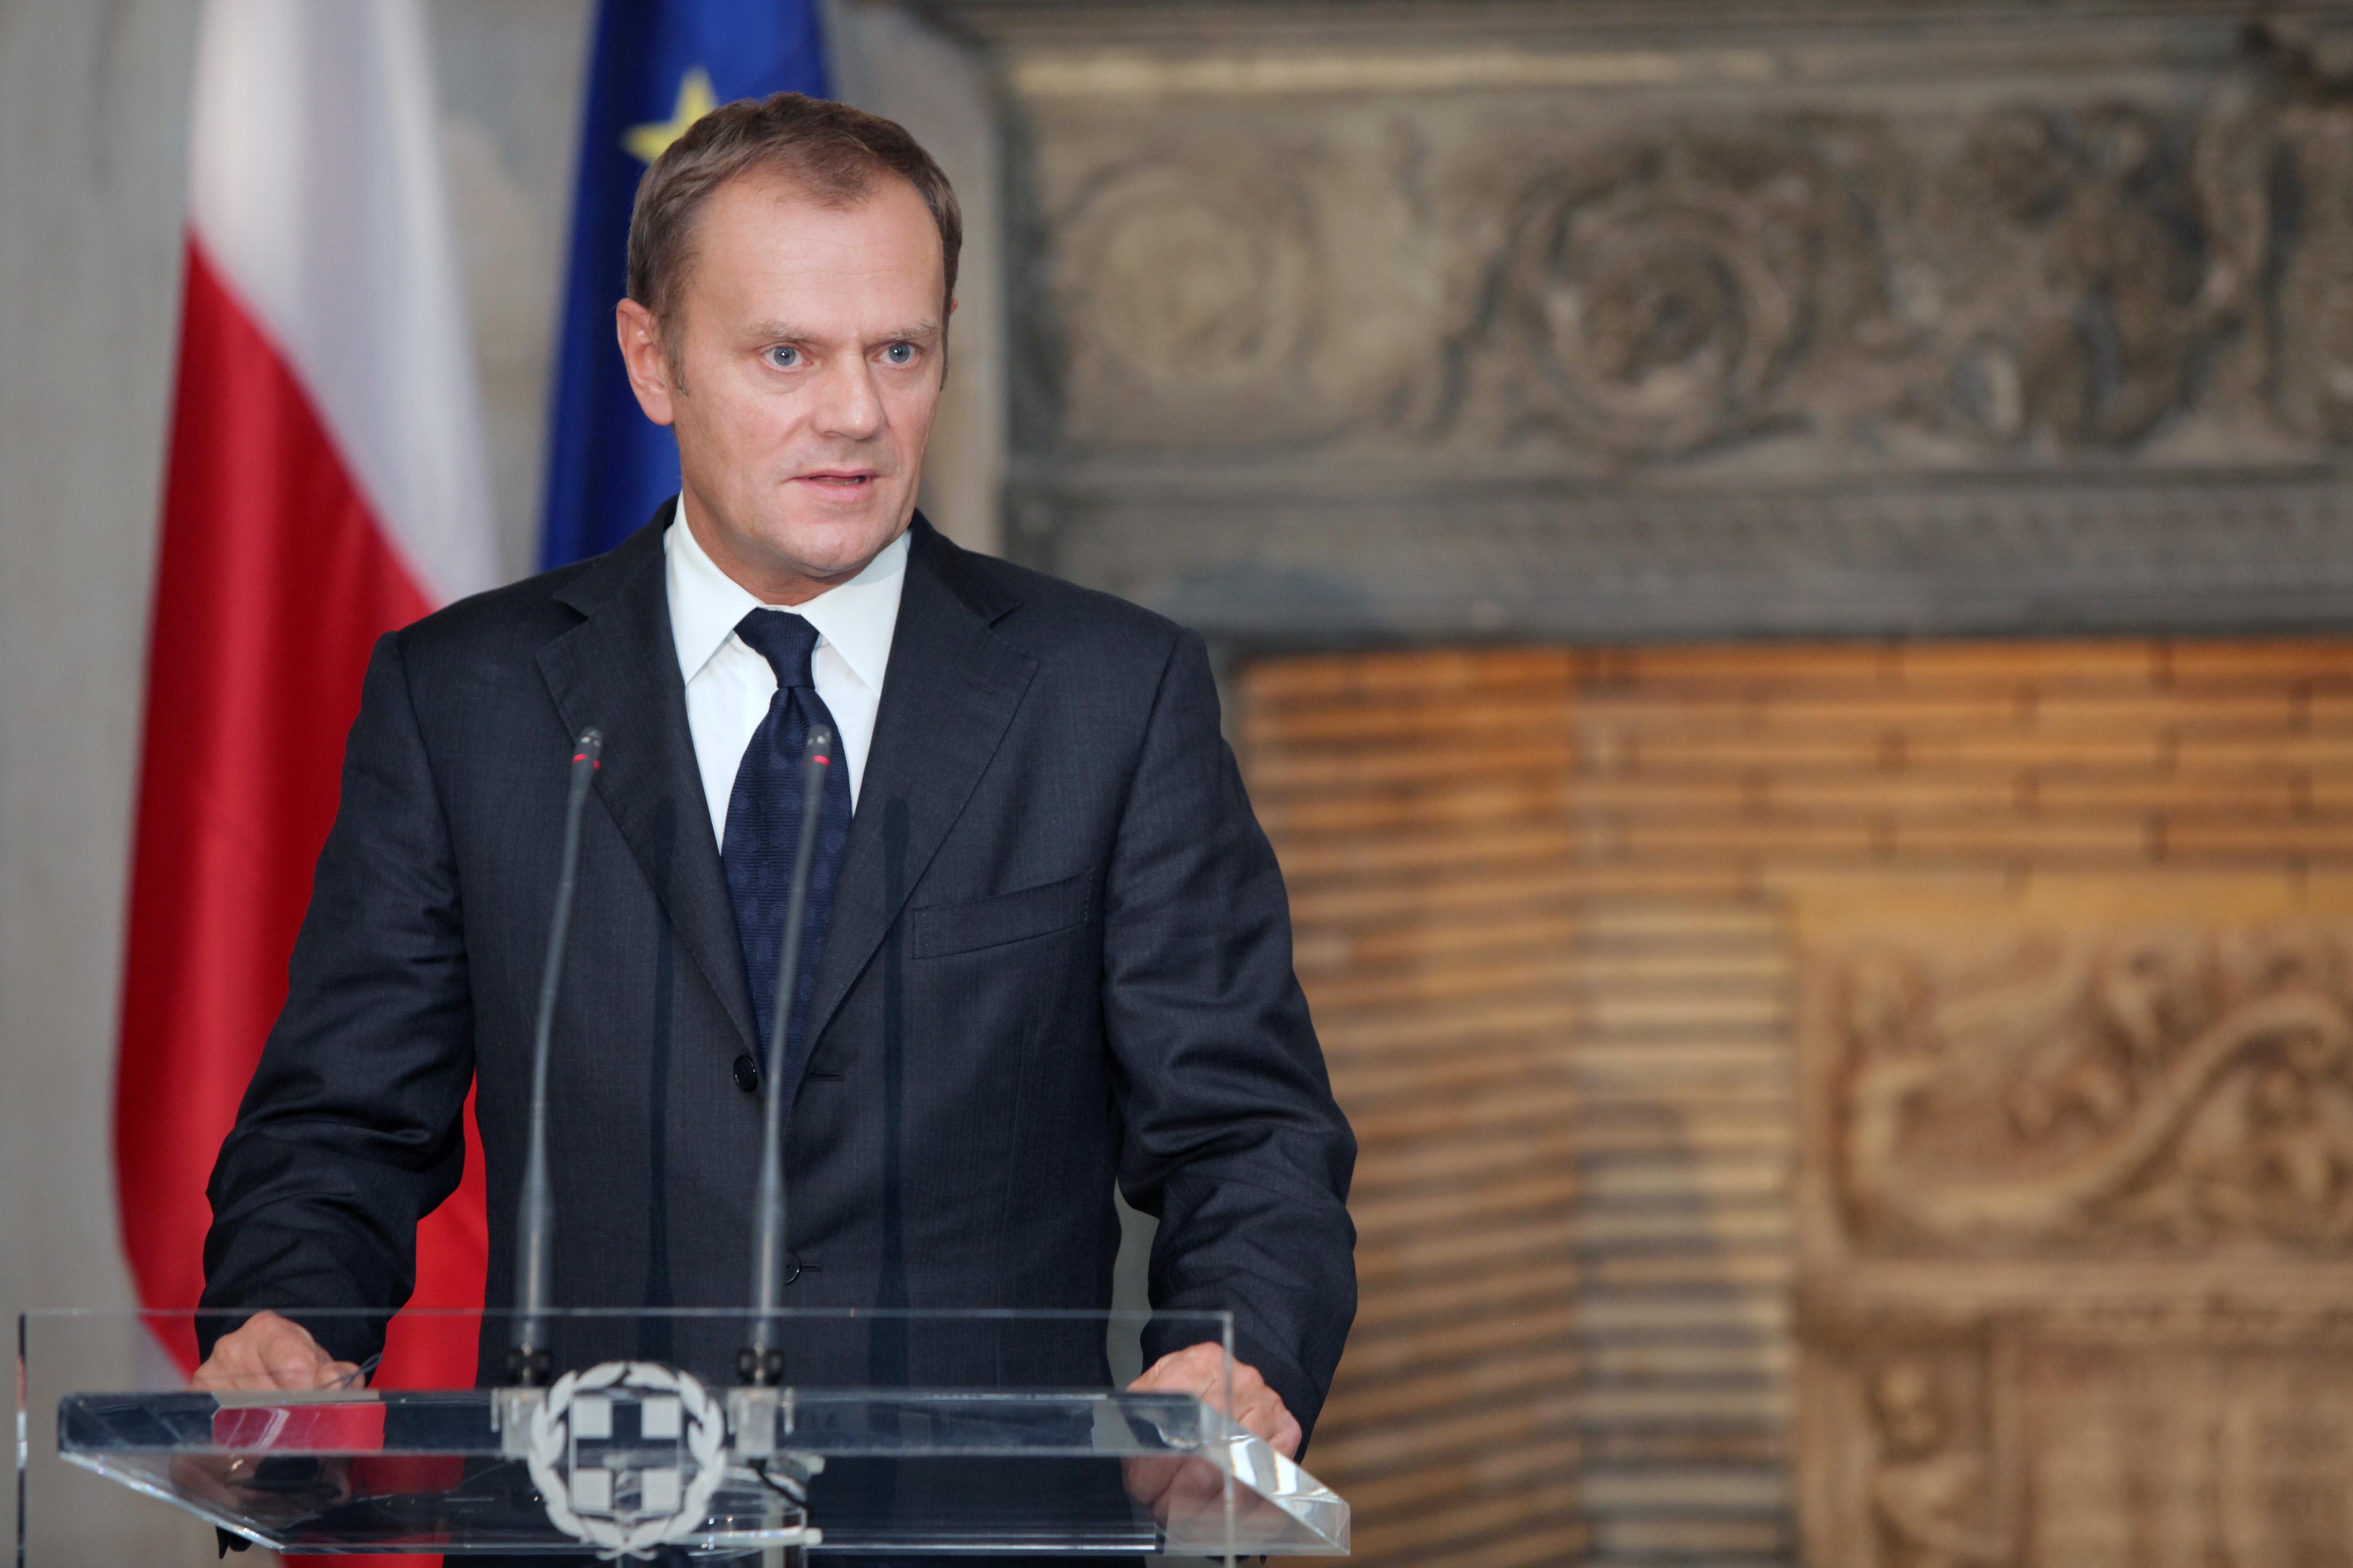 EU-Ratspräsident Donald Tusk erwartet einen EU-Beschluss zur Vermeidung von Brexit.